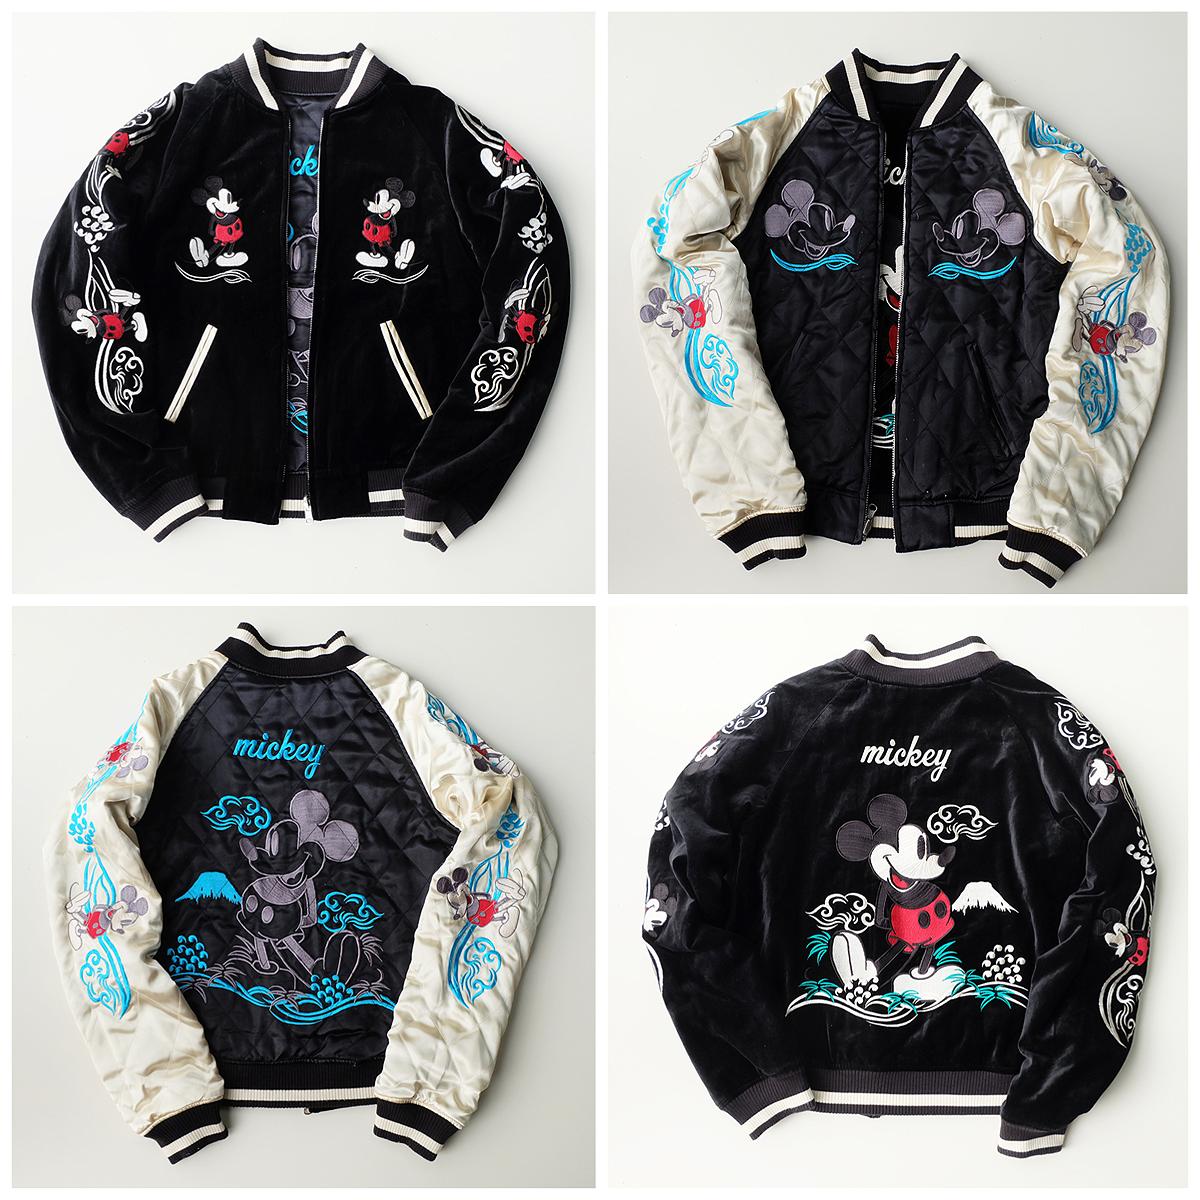 Super Rare Japanese Tokyo Disneyland Disney Character Mickey Mouse Embroidery Sukajan Souvenir Reversible Jacket Jaket [ 1200 x 1200 Pixel ]